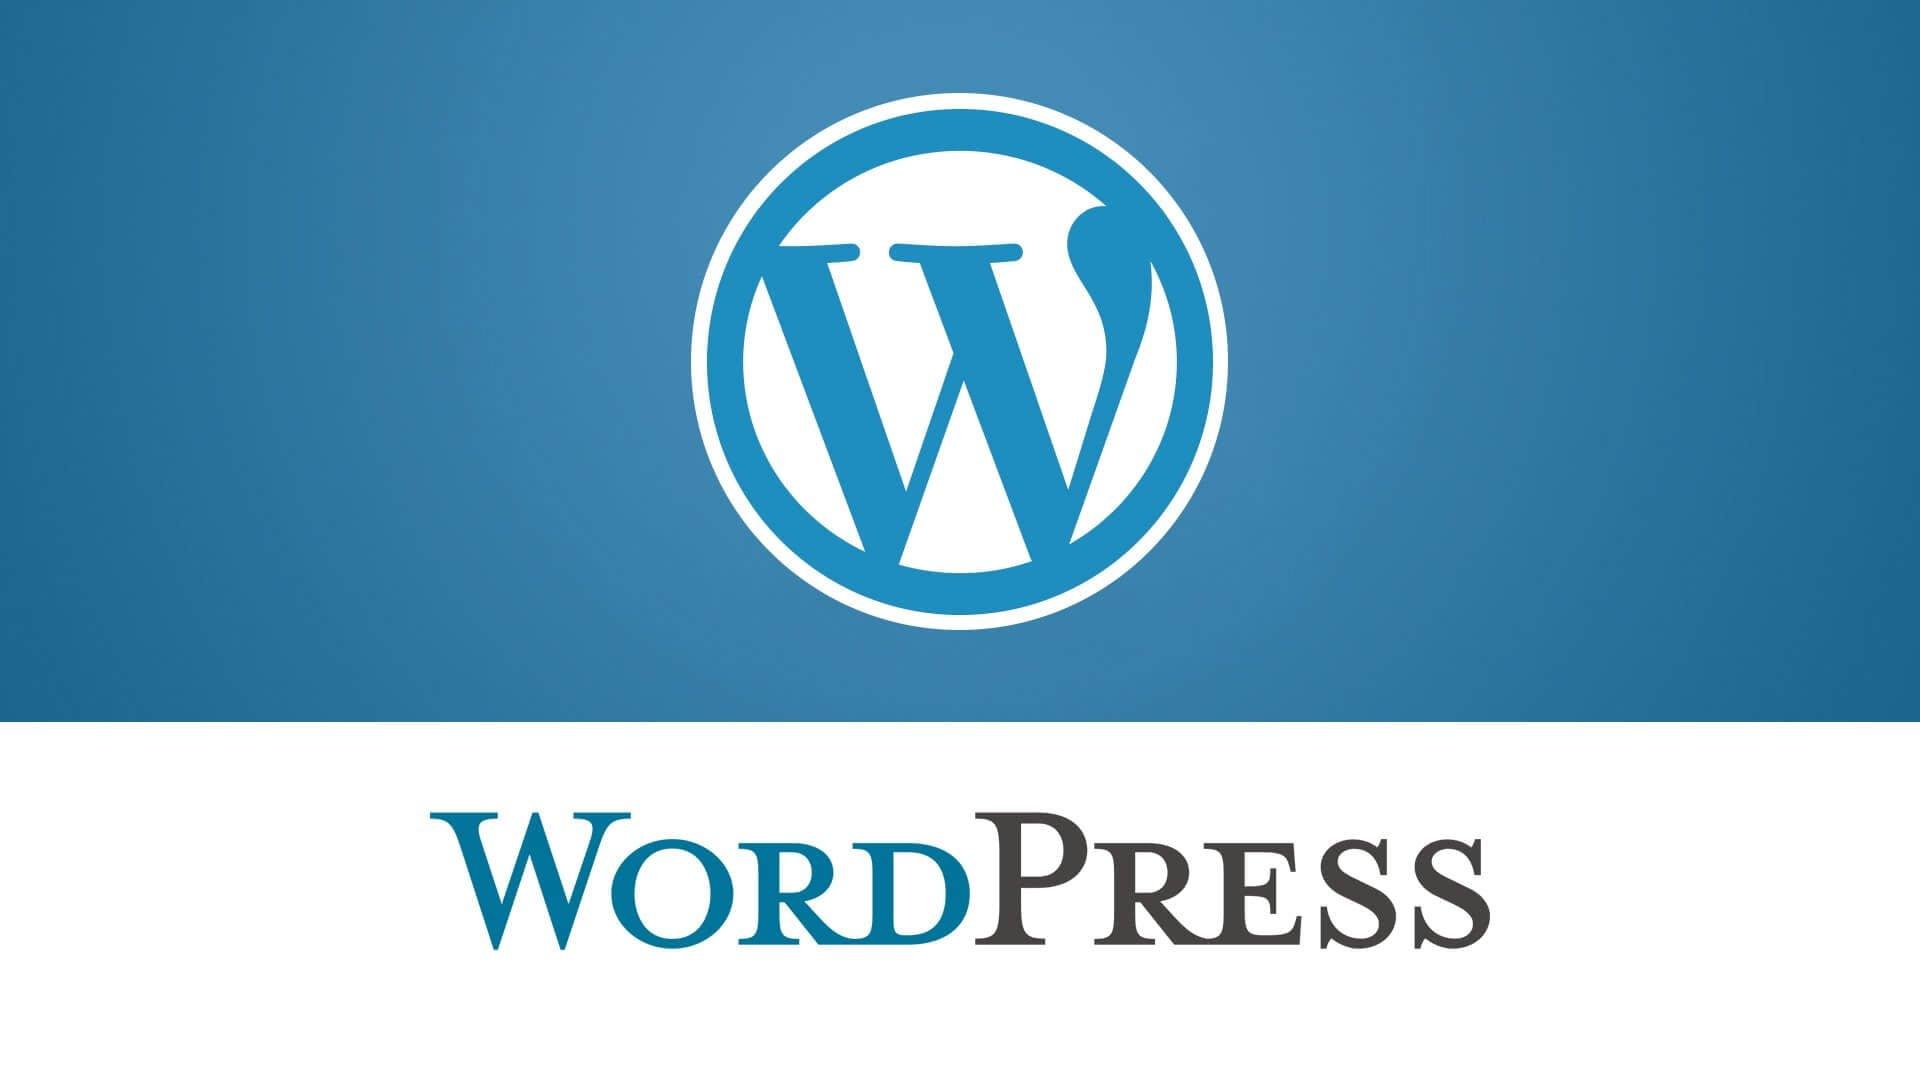 Wordpress kullanım limiti WordPress ''OUT OF MEMORY'' Hatası Çözüm Yöntemi WordPress ''OUT OF MEMORY'' Hatası Çözüm Yöntemi wordpress kaynak kullanimi